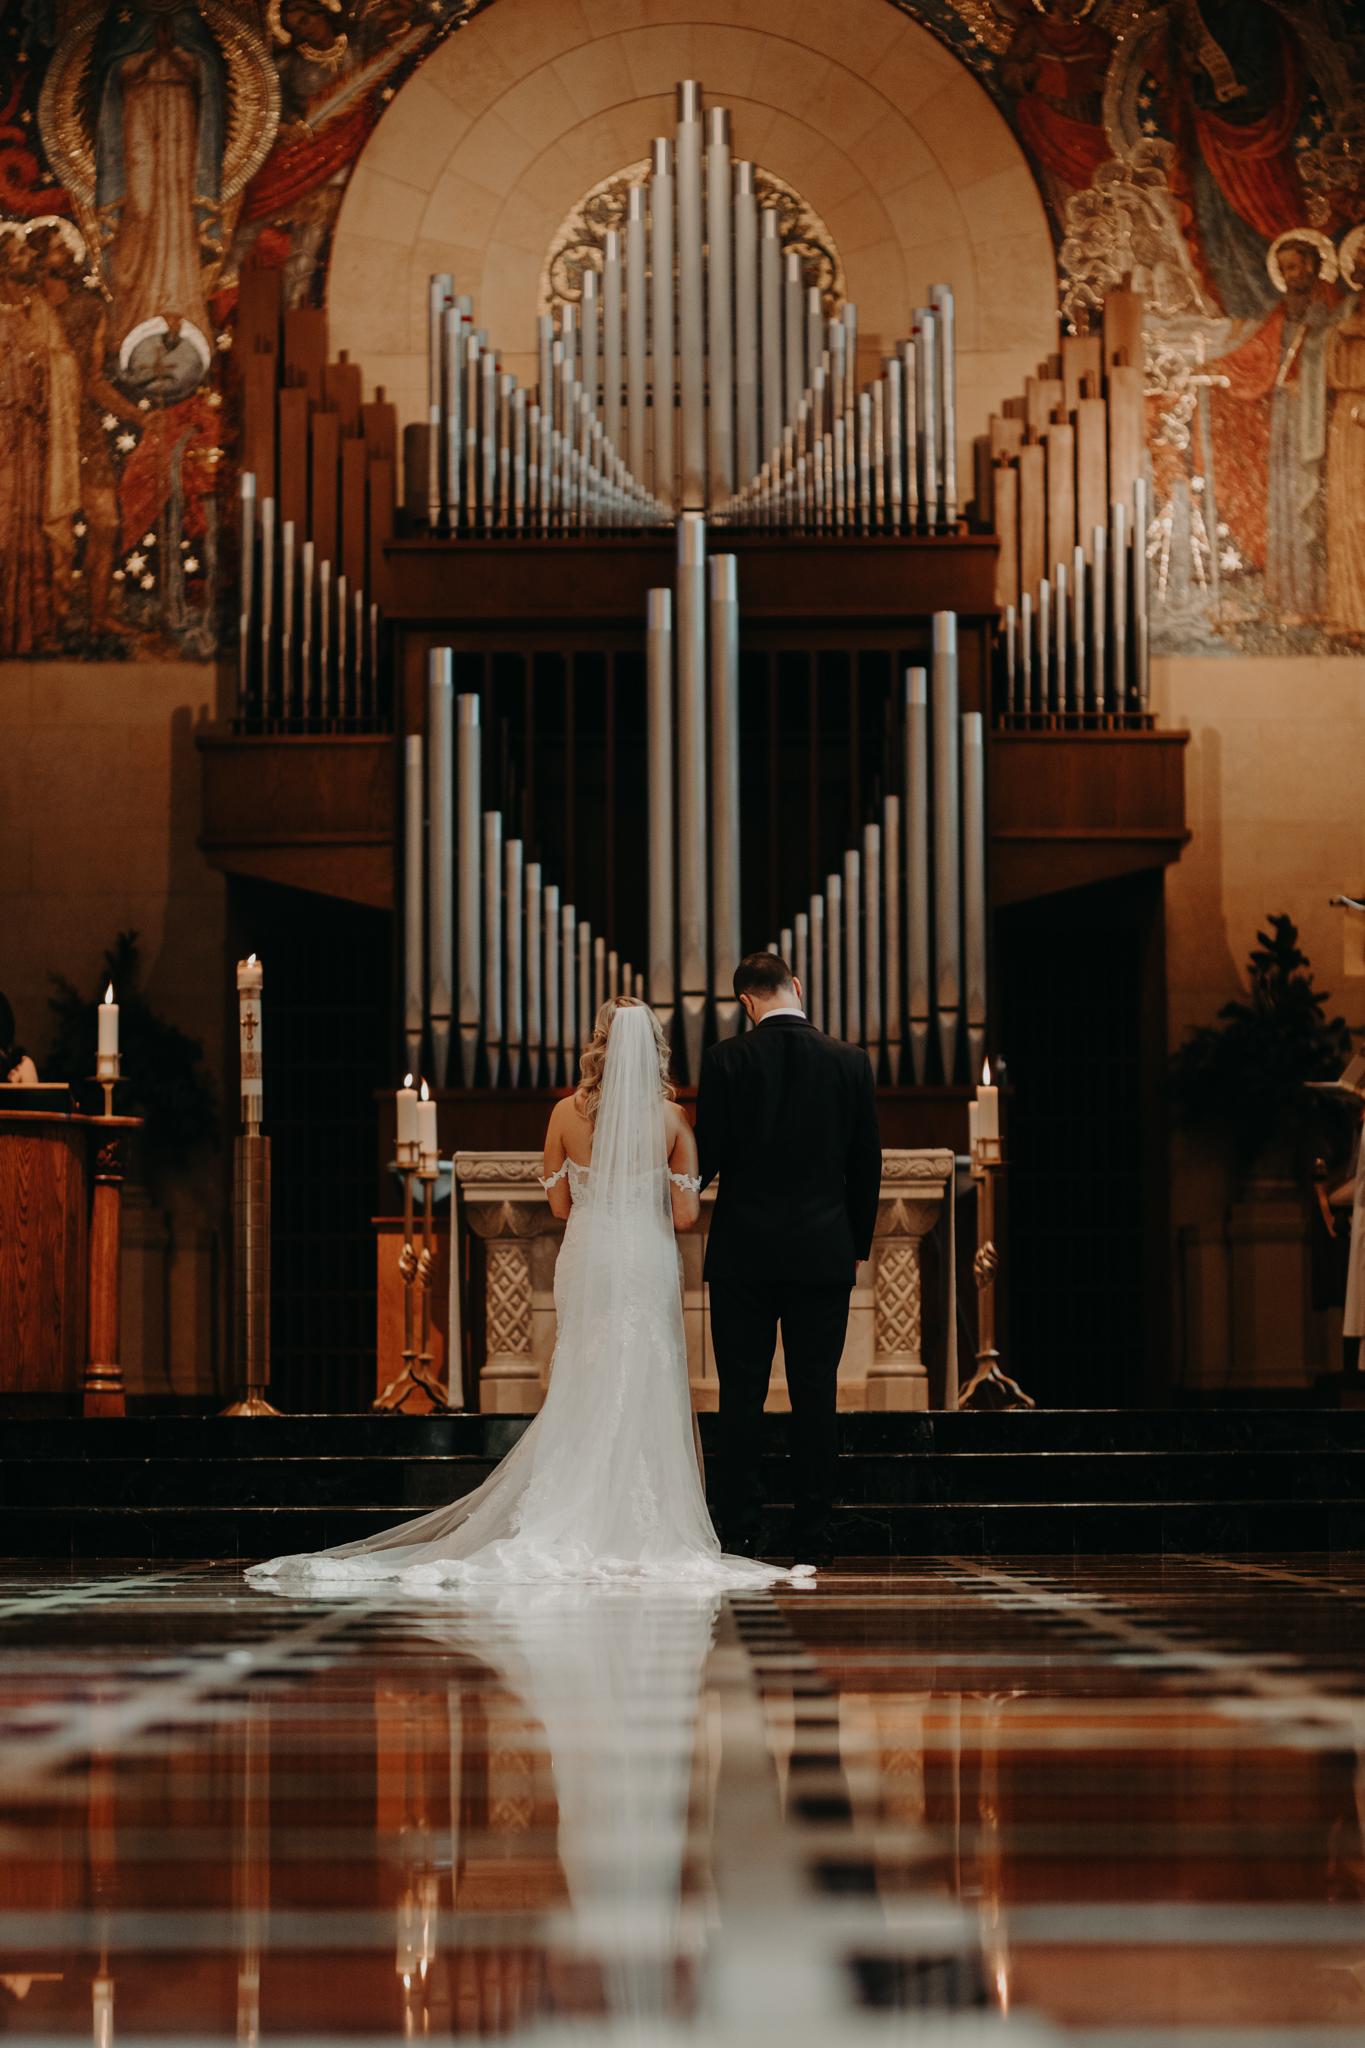 The-Inn-At-St-Johns-Wedding-41.jpg